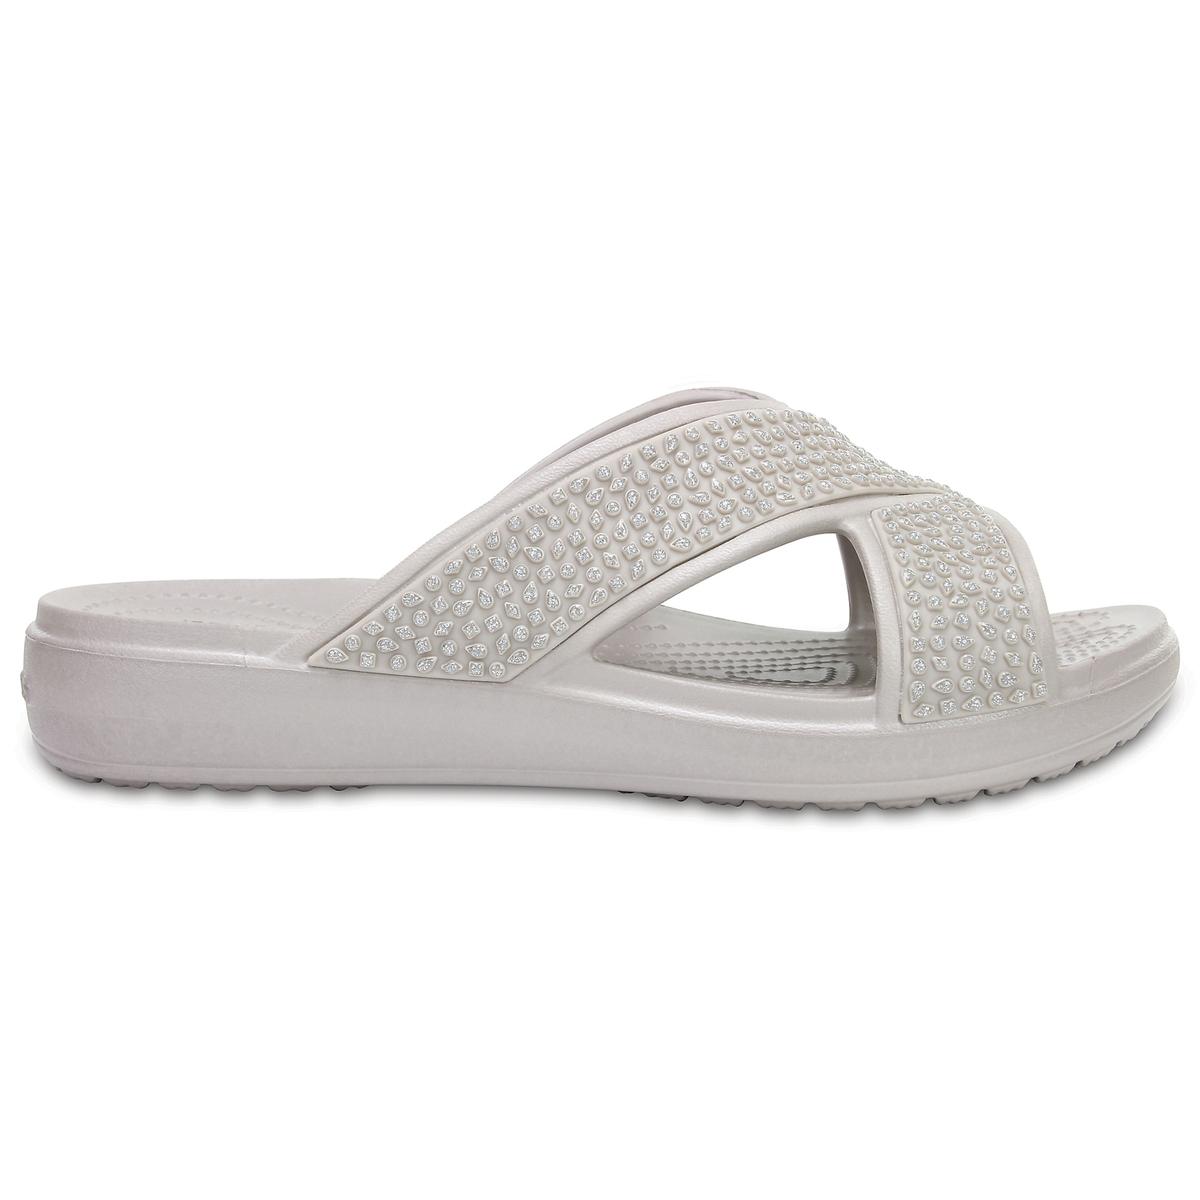 Туфли без задника синтетические туфли без задника